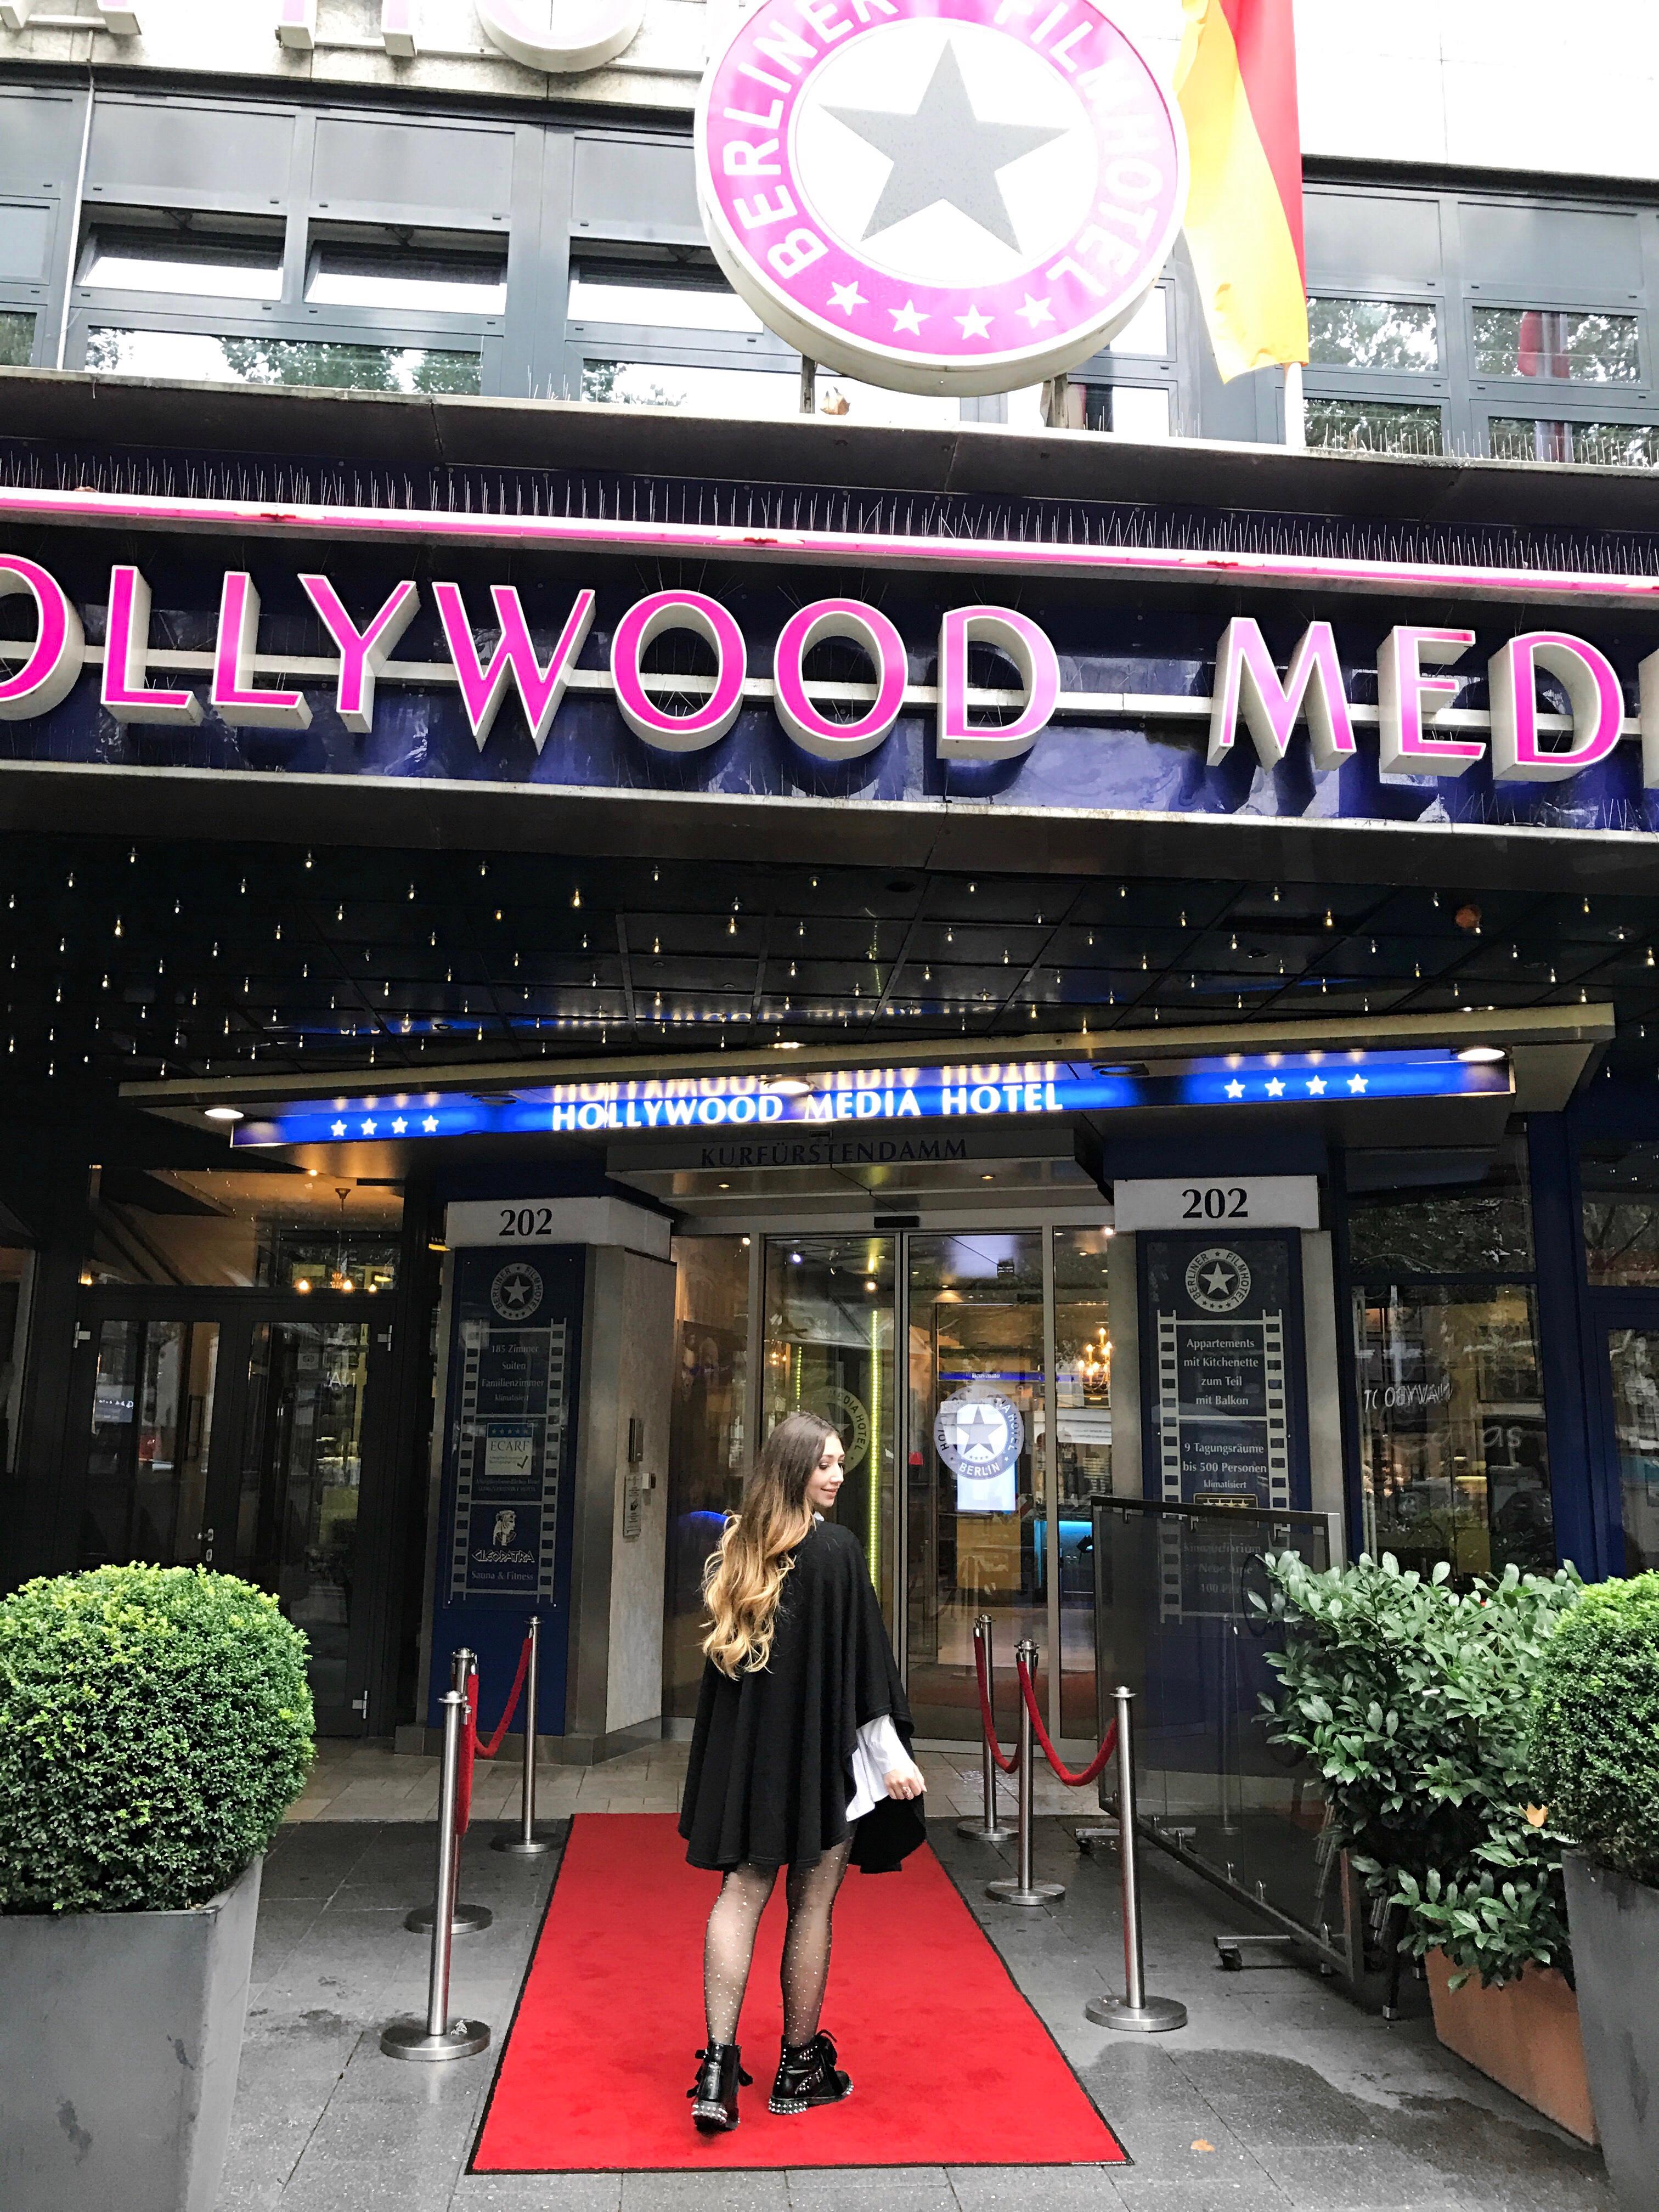 Hollywood Media Hotel Berlin Glamourlovexoxo